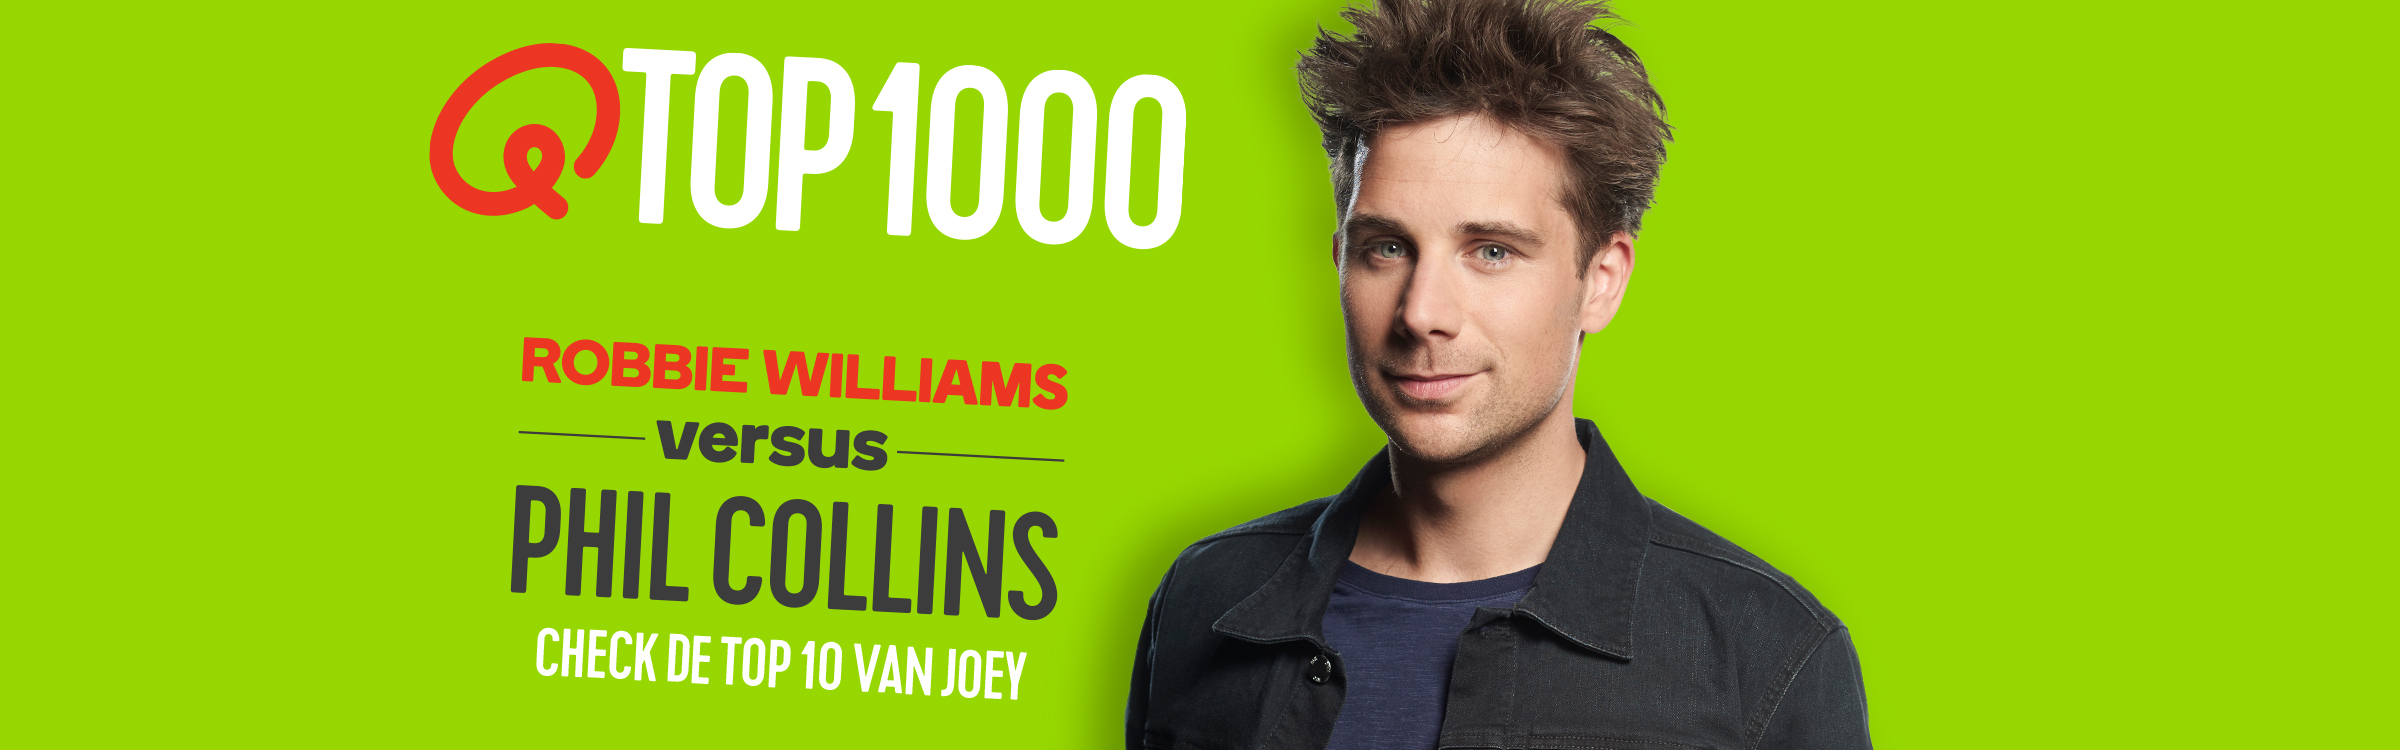 Qmusic actionheader top1000 djs joey